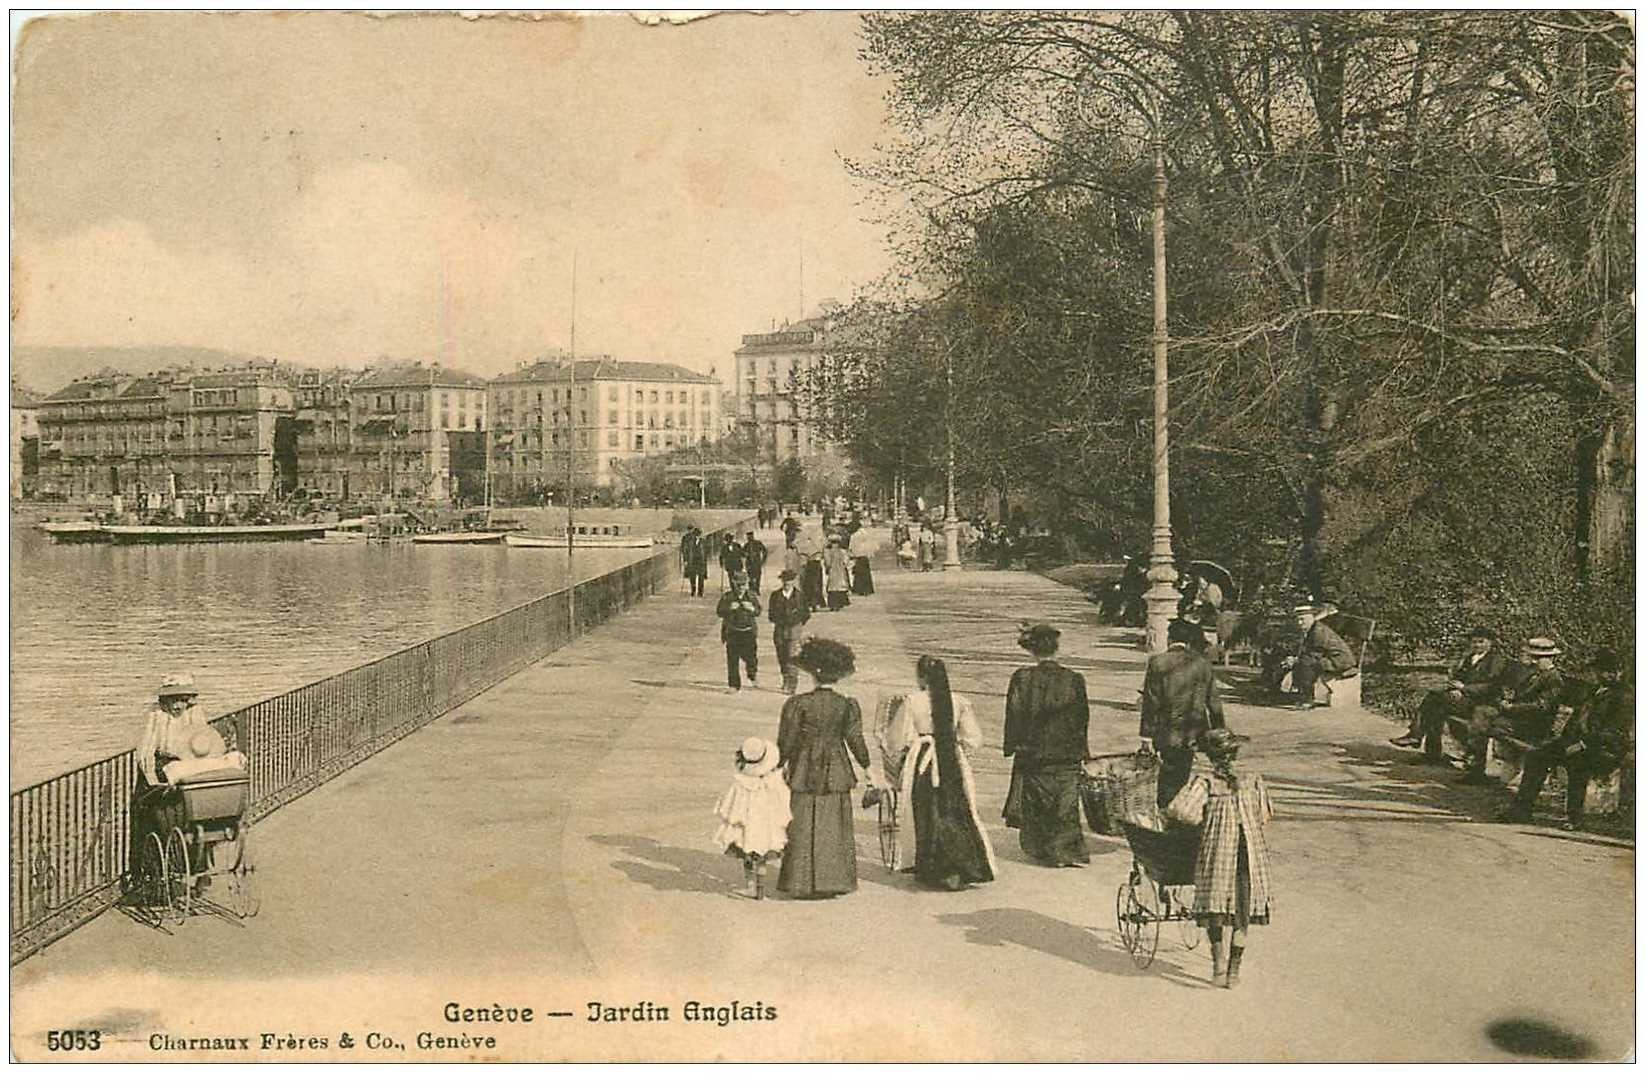 Carte postale ancienne suisse gen ve jardin anglais 1915 for Jardin anglais geneve suisse